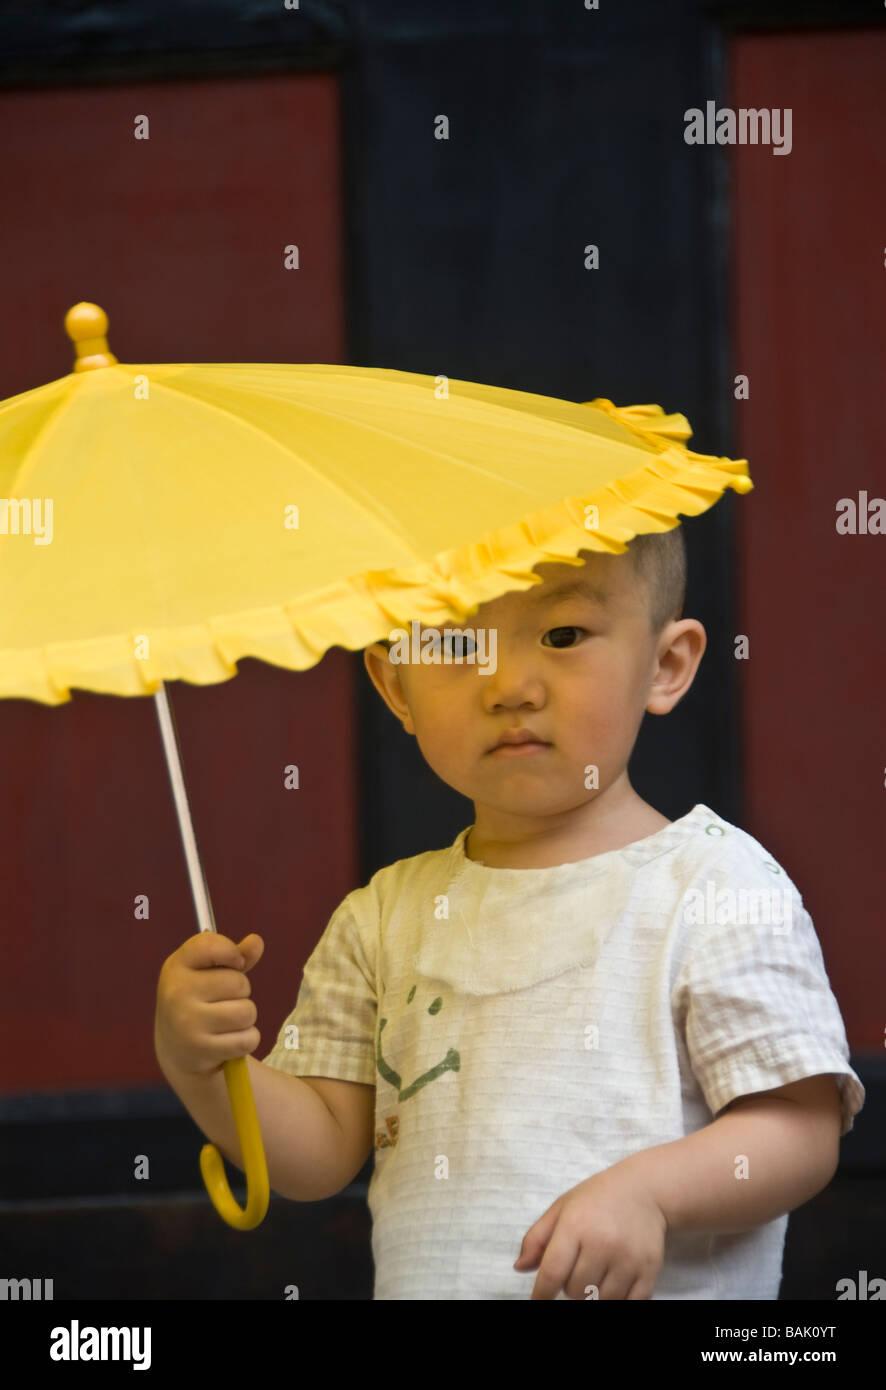 China yellow clothes boy